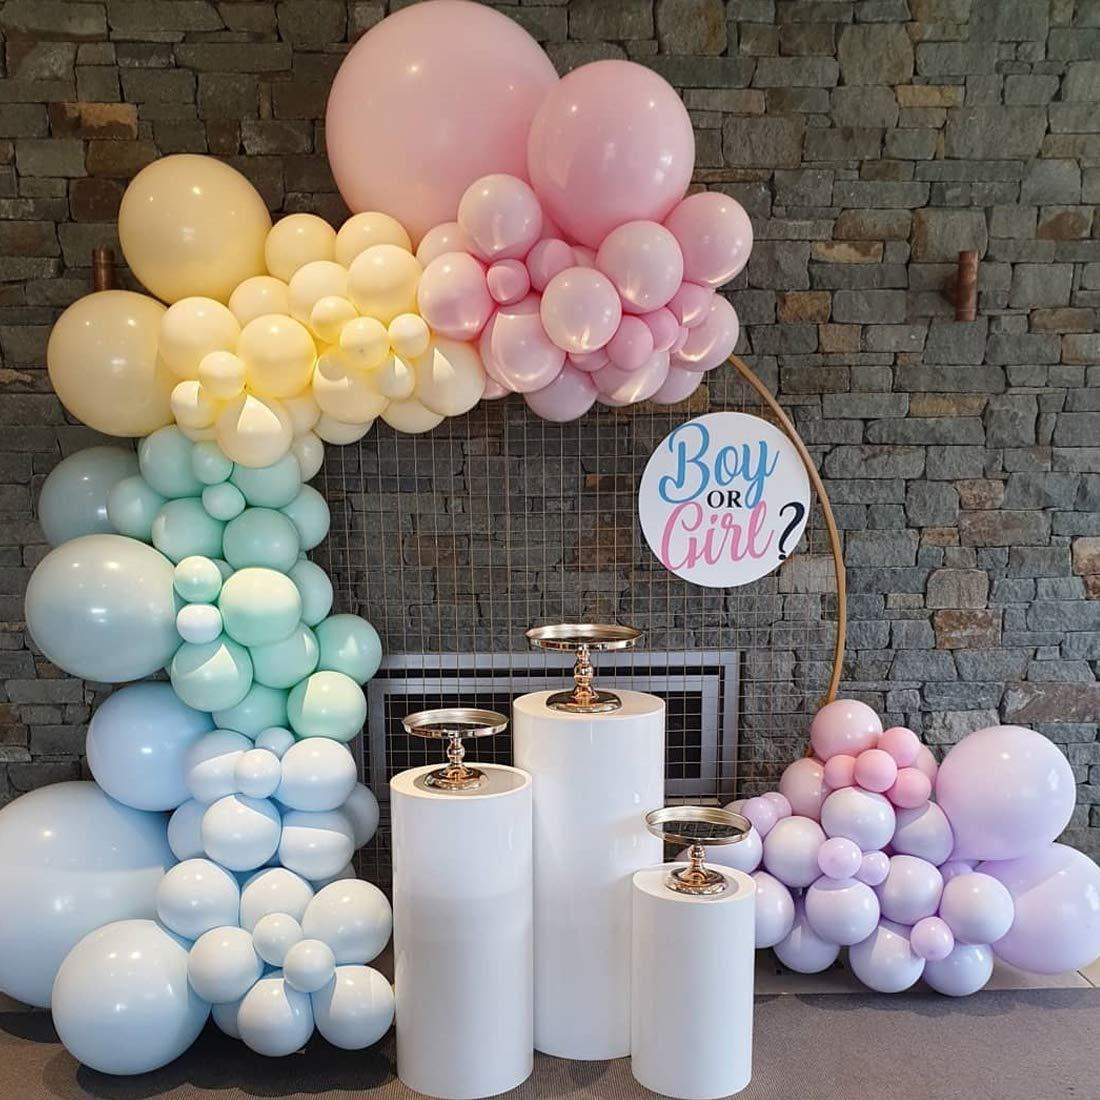 Yiran 130 Pieces Unicorn Balloon Garland Arch Kit 5M16ft Long Macaron Balloons